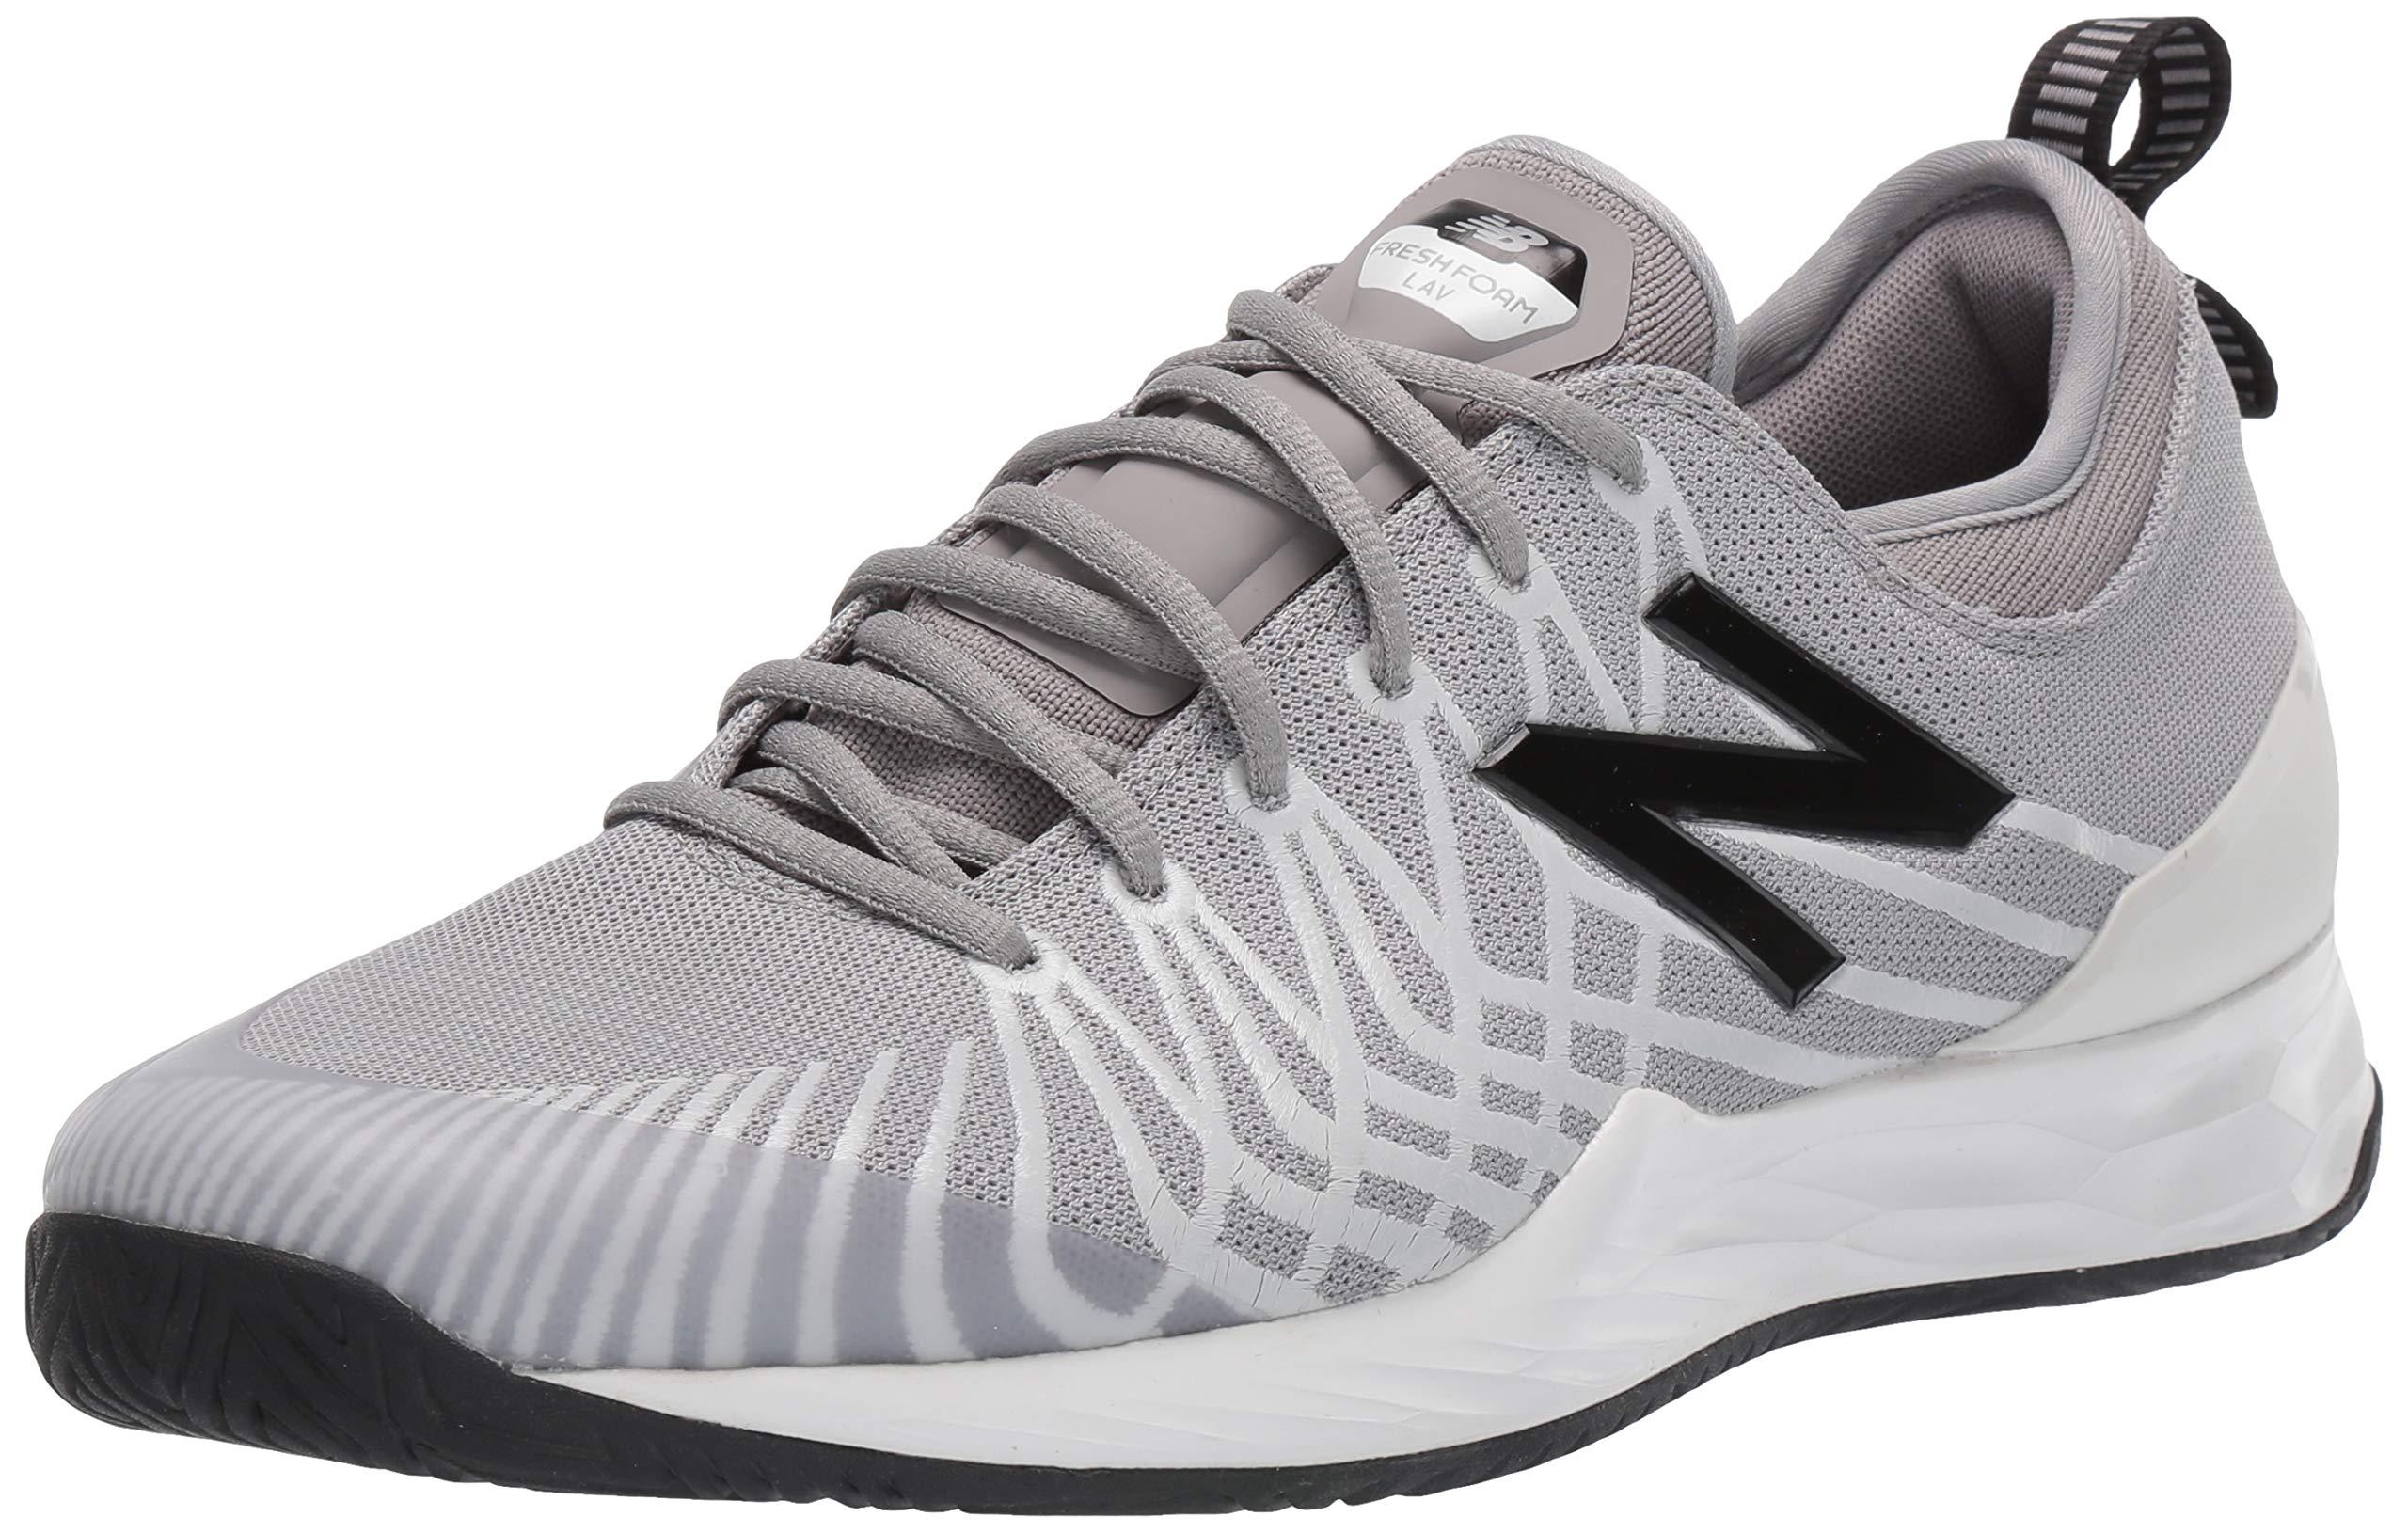 New Balance Men's LAV V1 Hard Court Tennis Shoe, Marblehead/Black, 5 D US